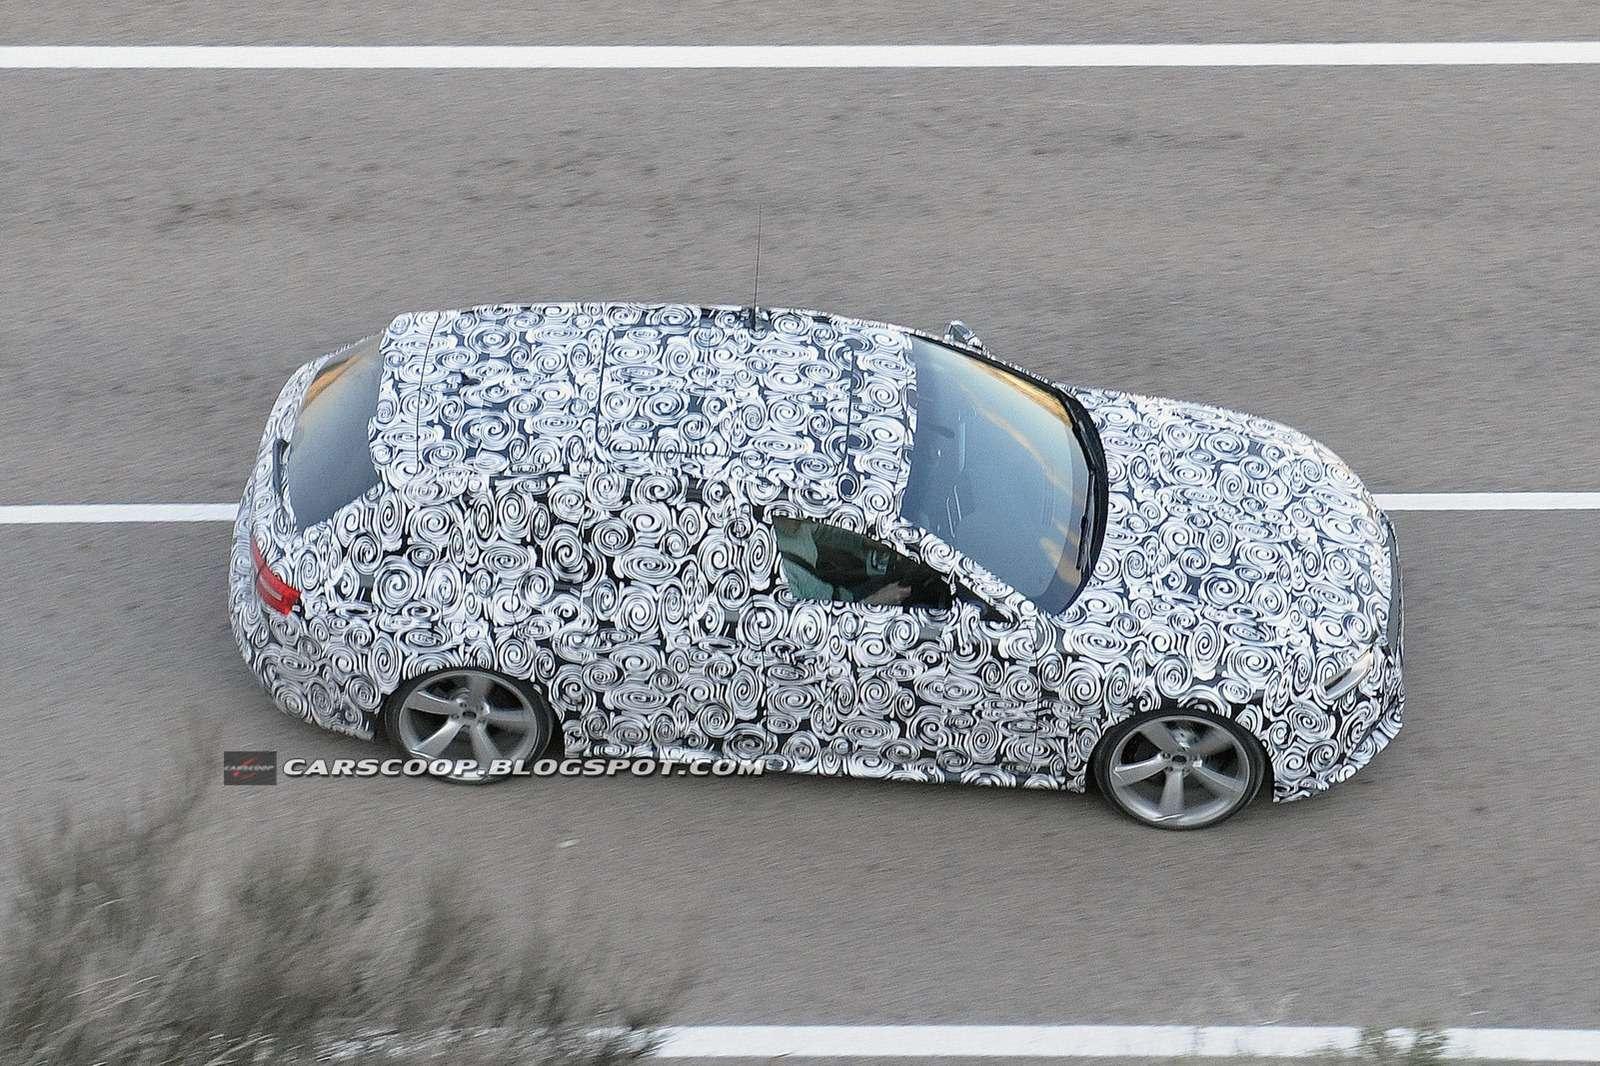 2013 Audi RS4 Avant fot szpieg luty 2012